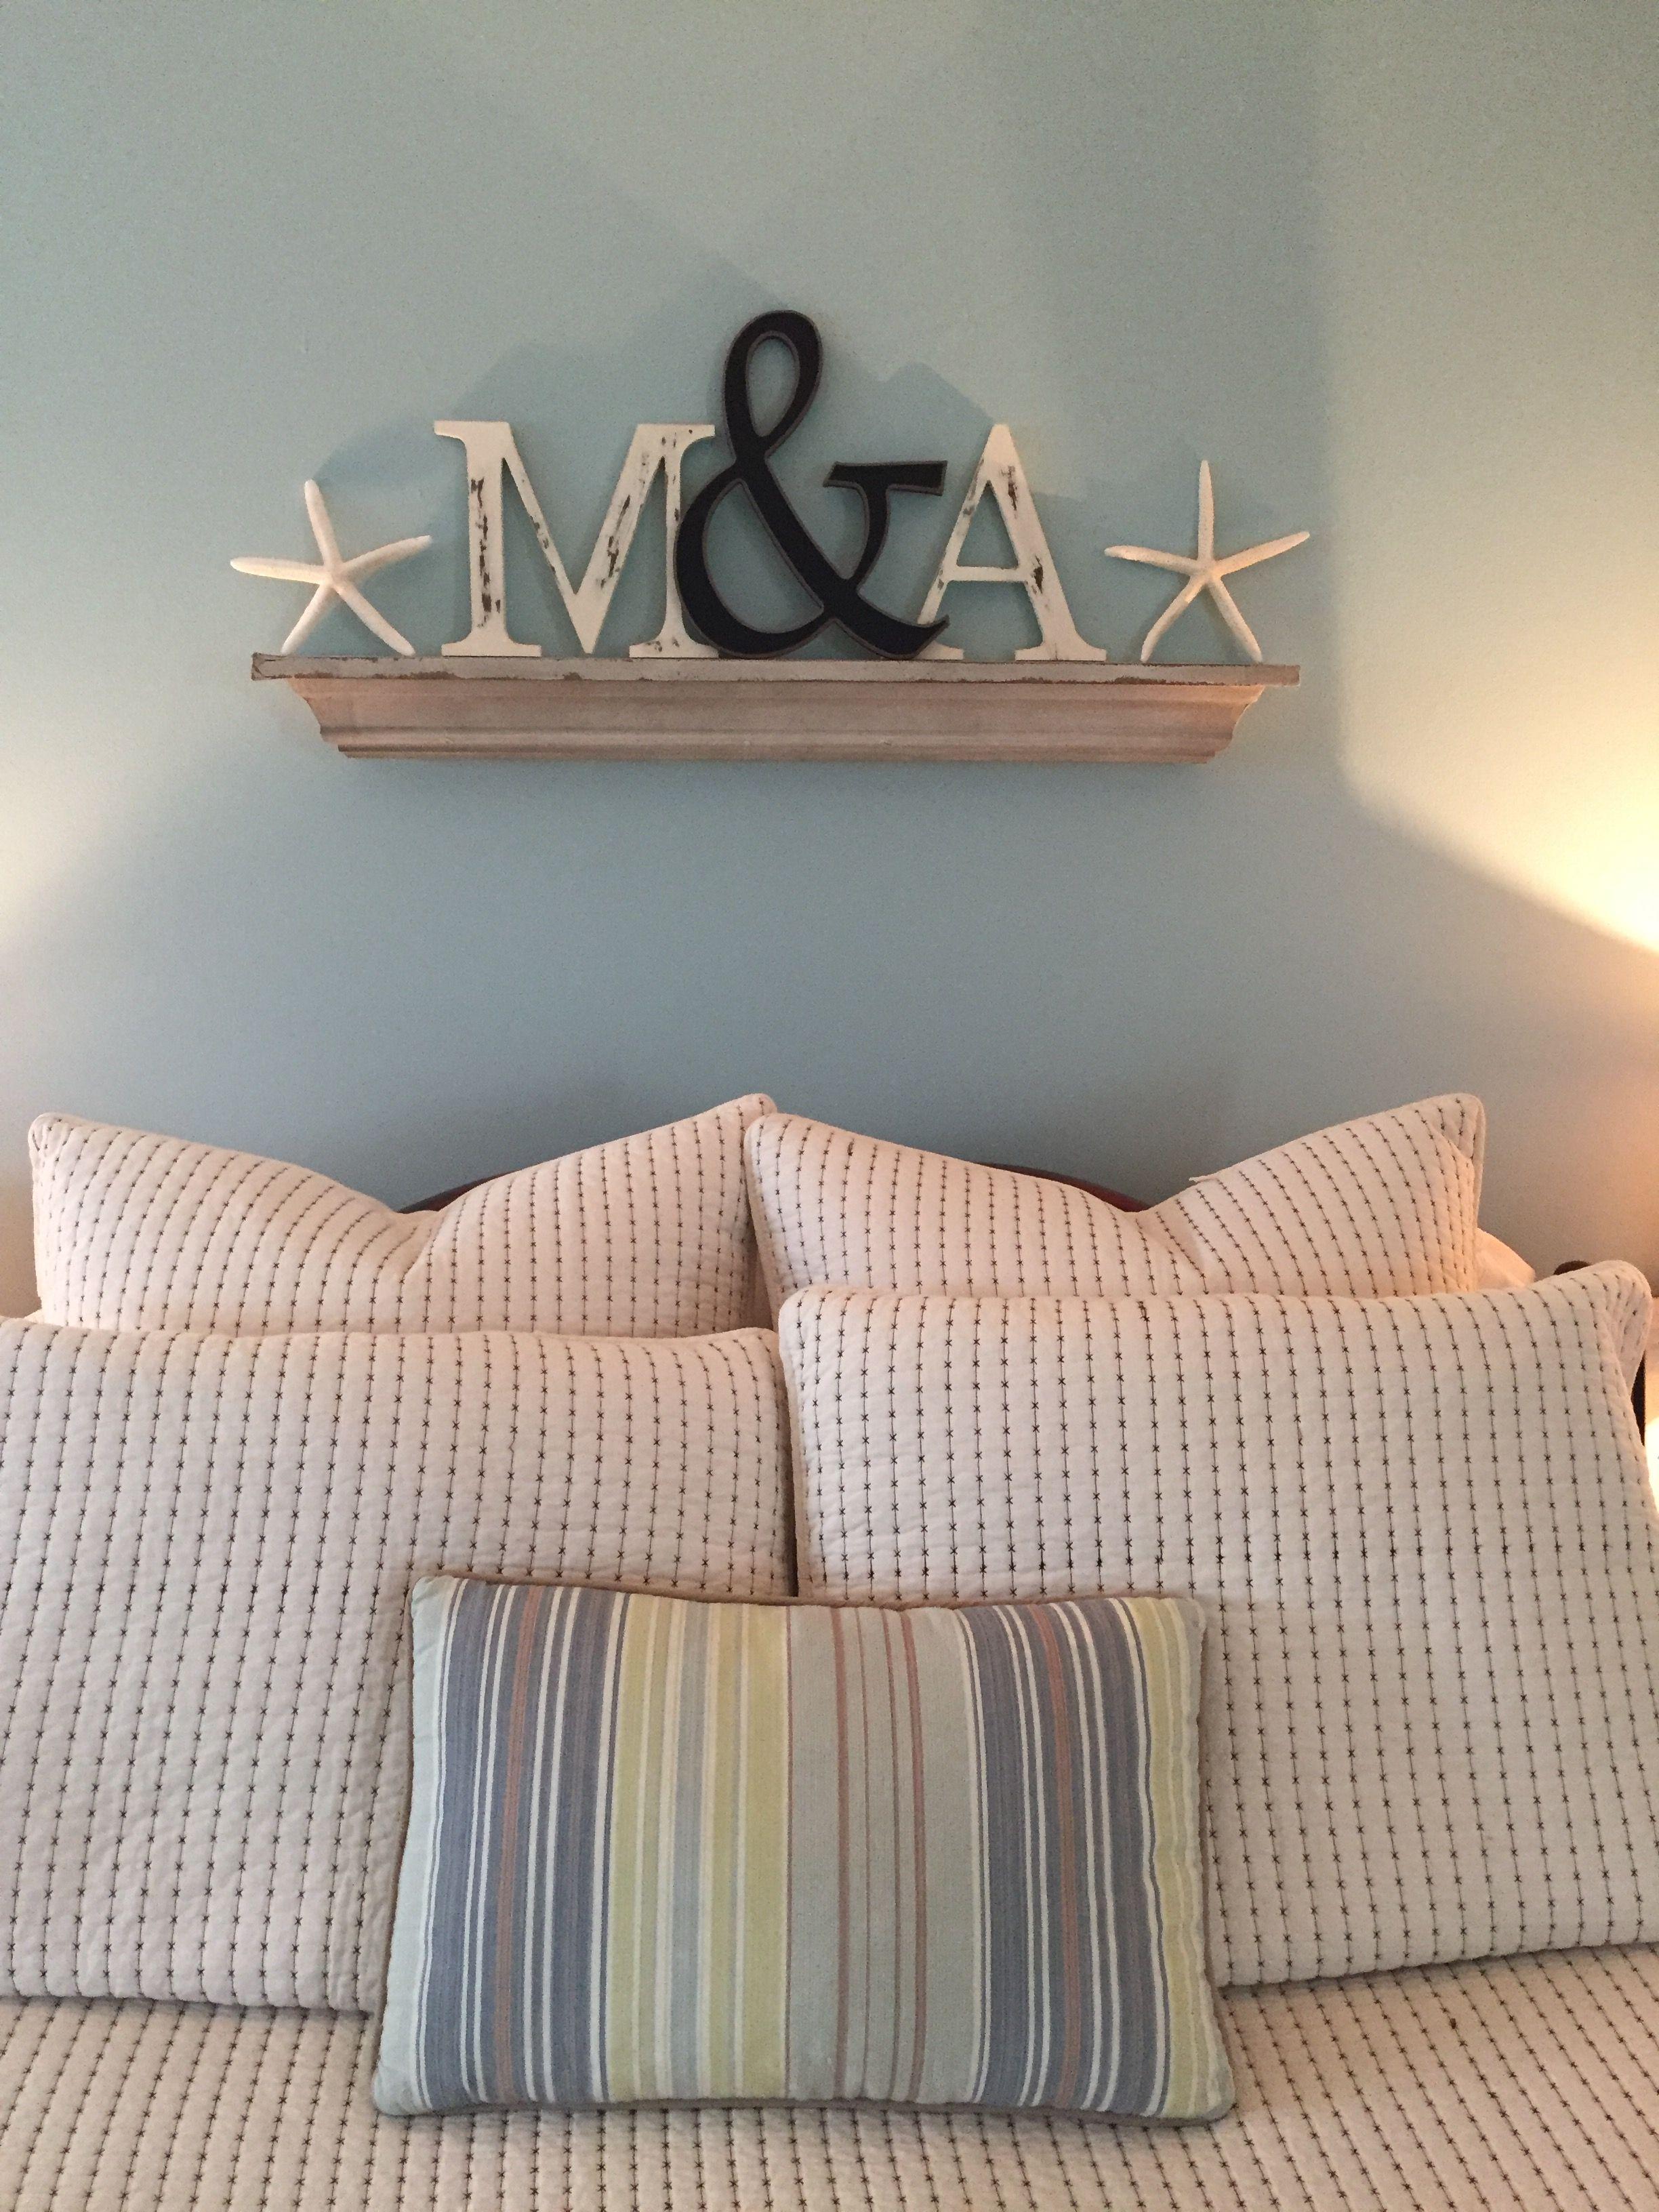 Master bedroom shelves above the bed  coastal decor romantic bedroom mantle shelf above bed distressed